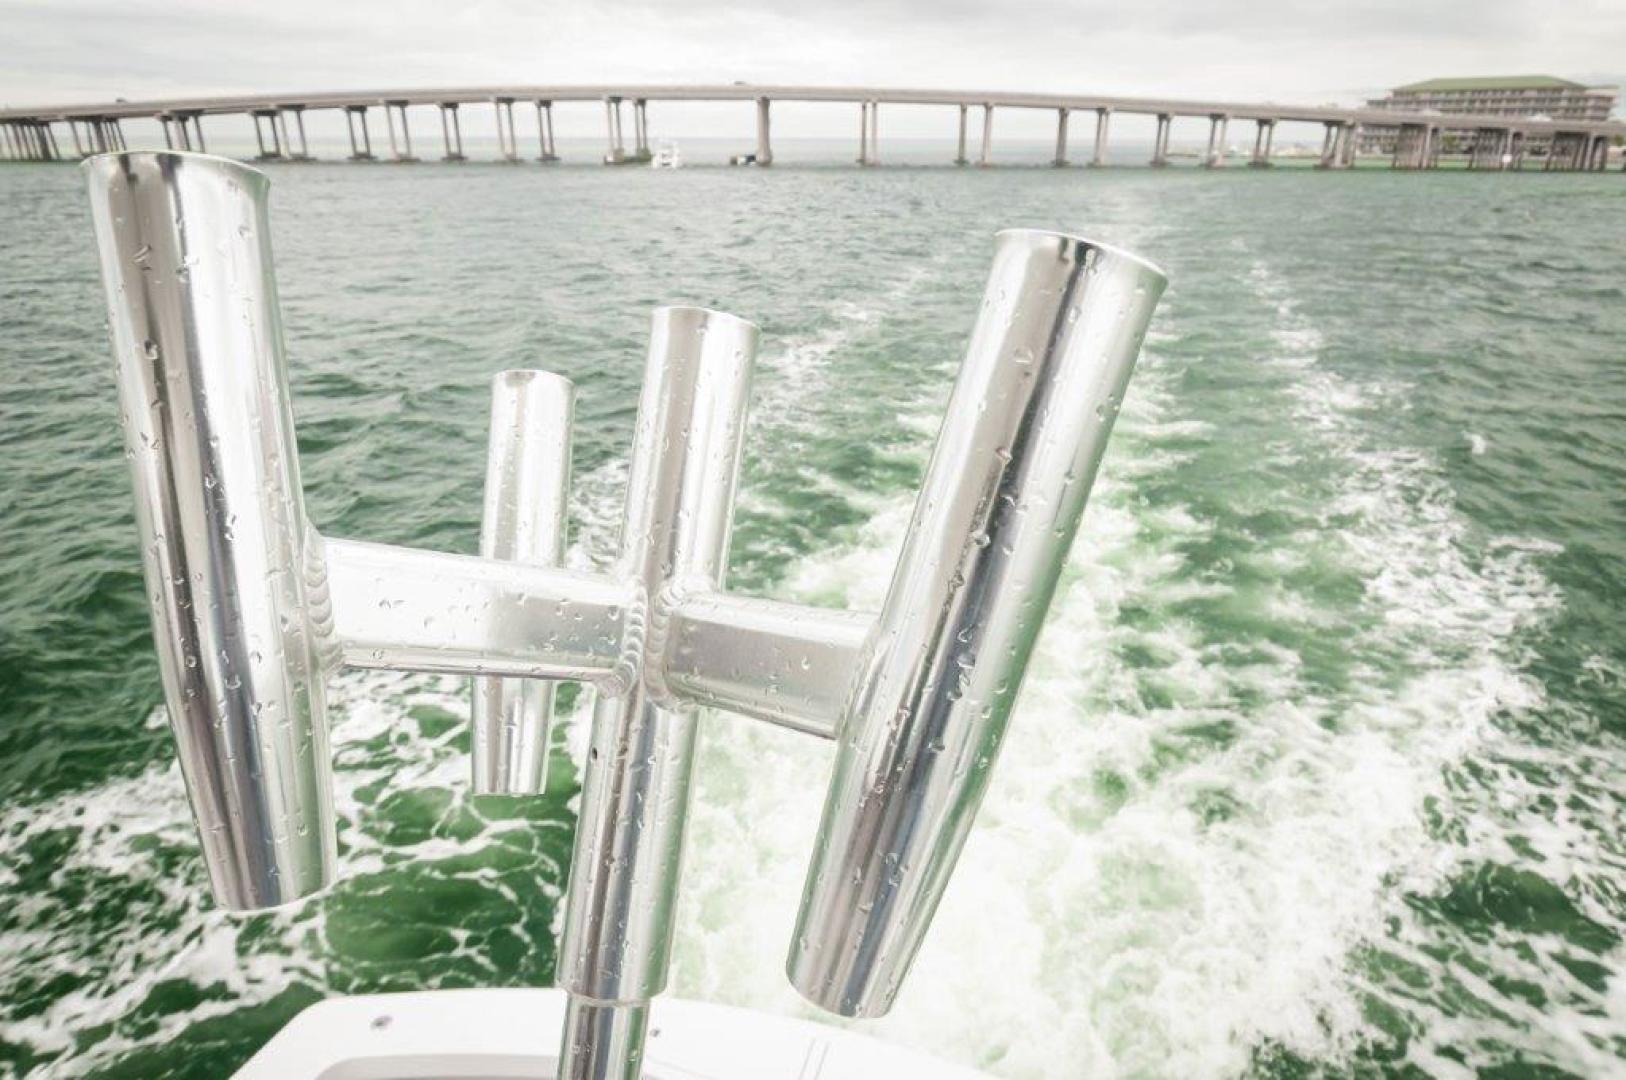 Viking-76 Sportfish 2012-Team Supreme Destin-Florida-United States-2012 Viking 76 Convertible   Rocket Launchers-1284483 | Thumbnail